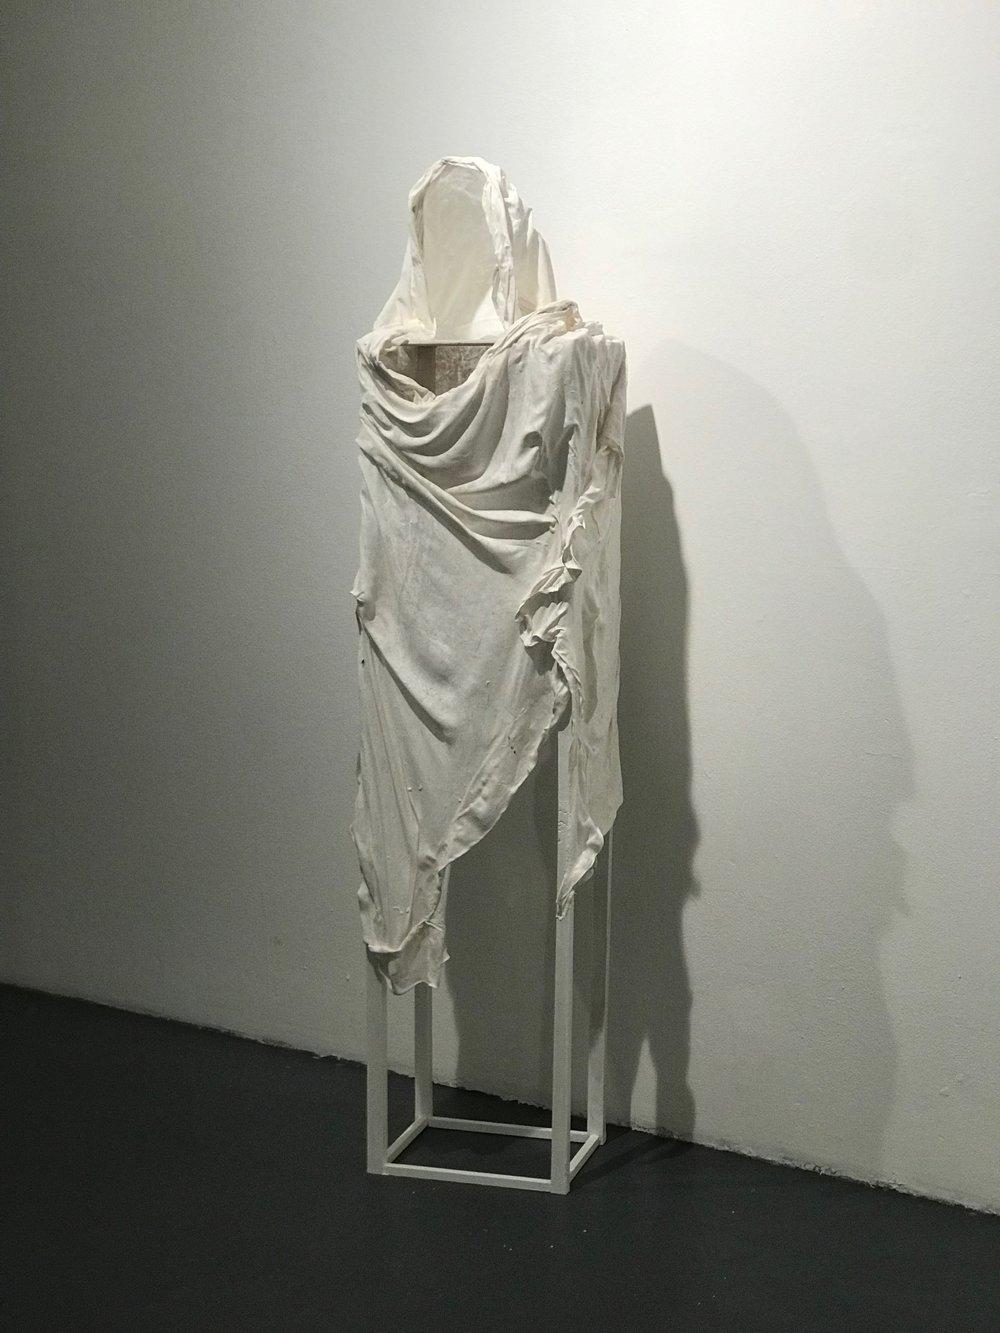 Veil #1